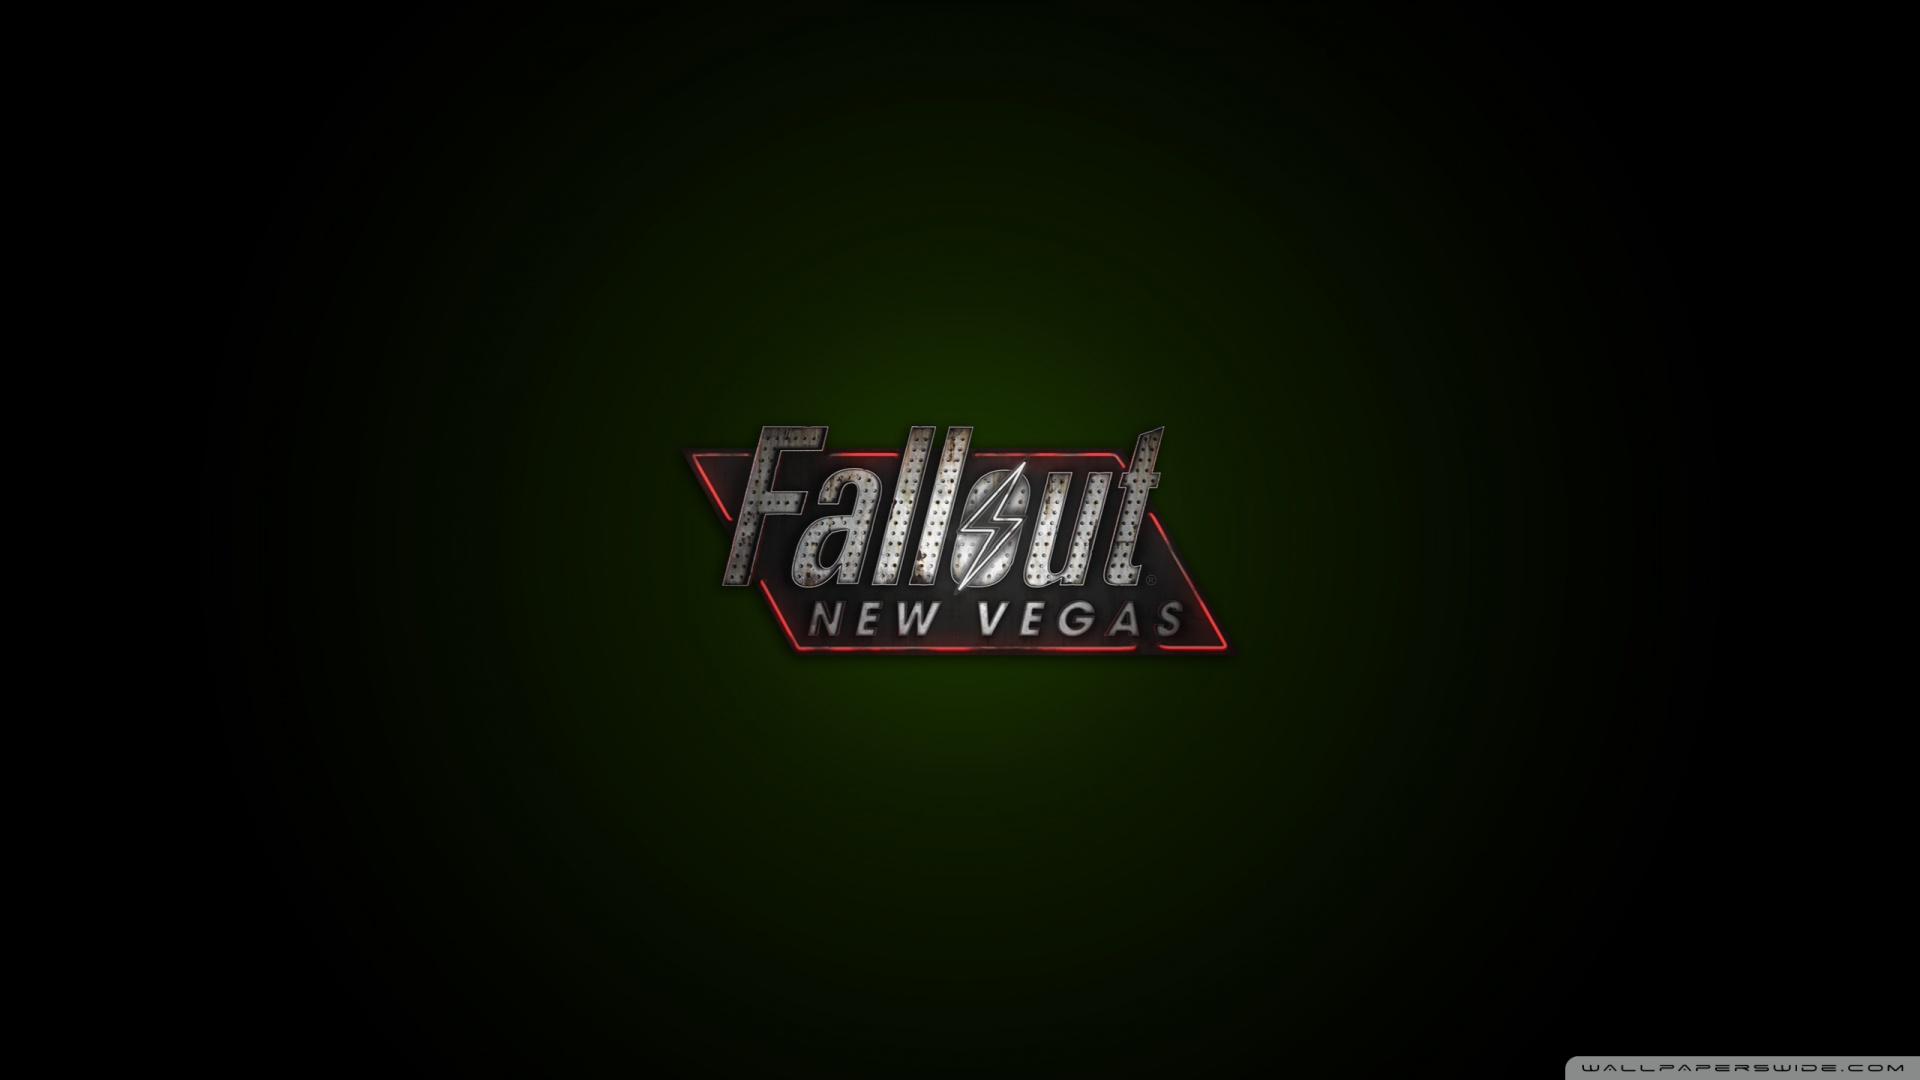 Fallout New Vegas Logo Green Wallpaper 1920x1080 Fallout New Vegas 1920x1080